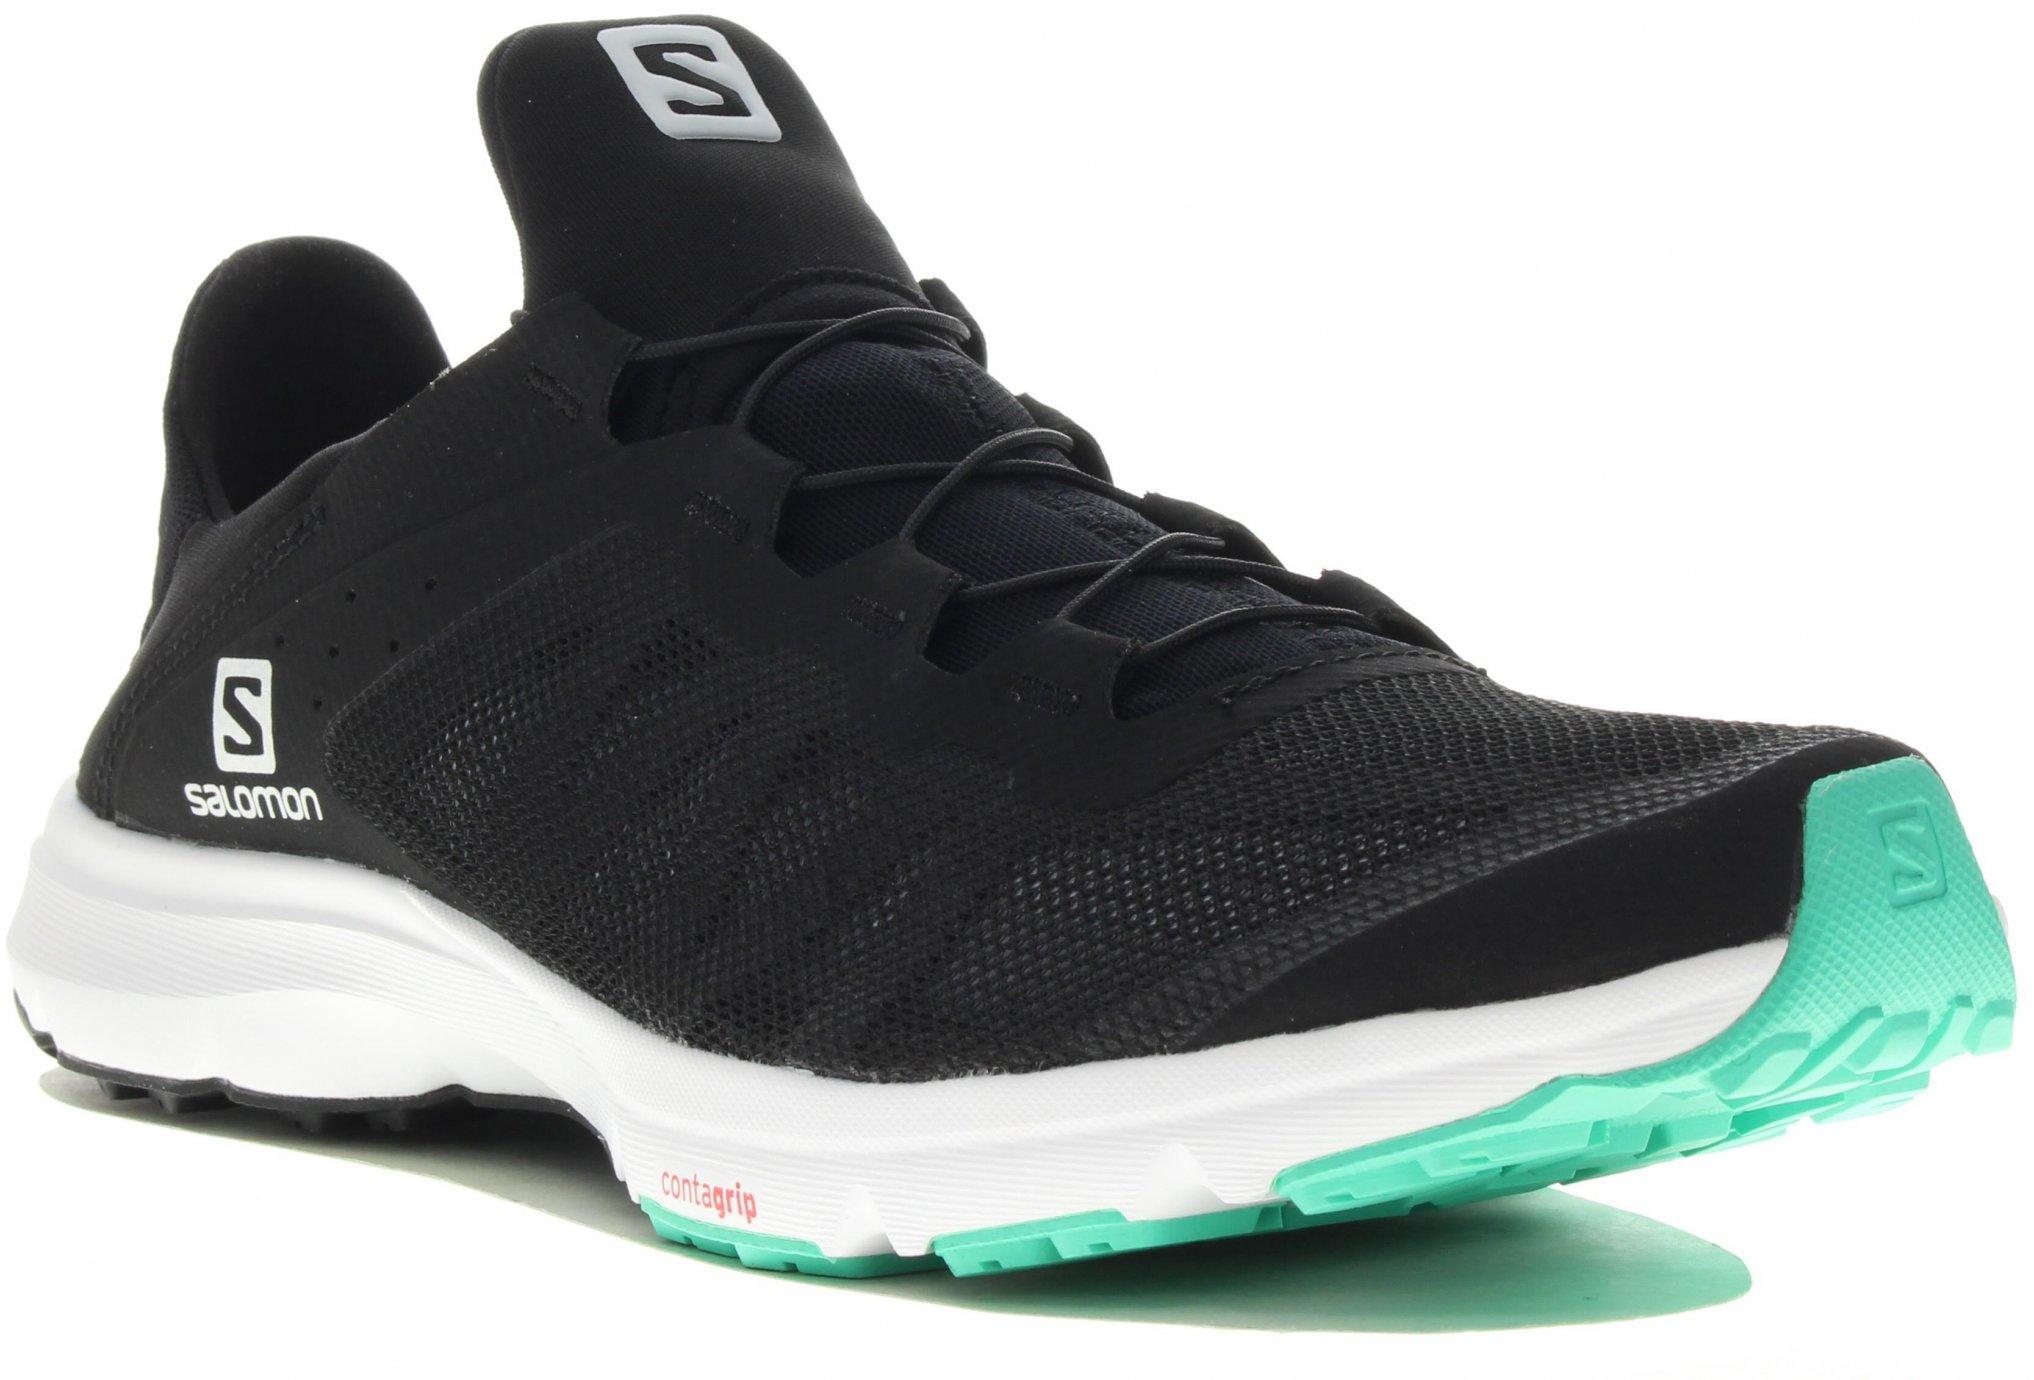 Salomon Amphib Bold Chaussures running femme